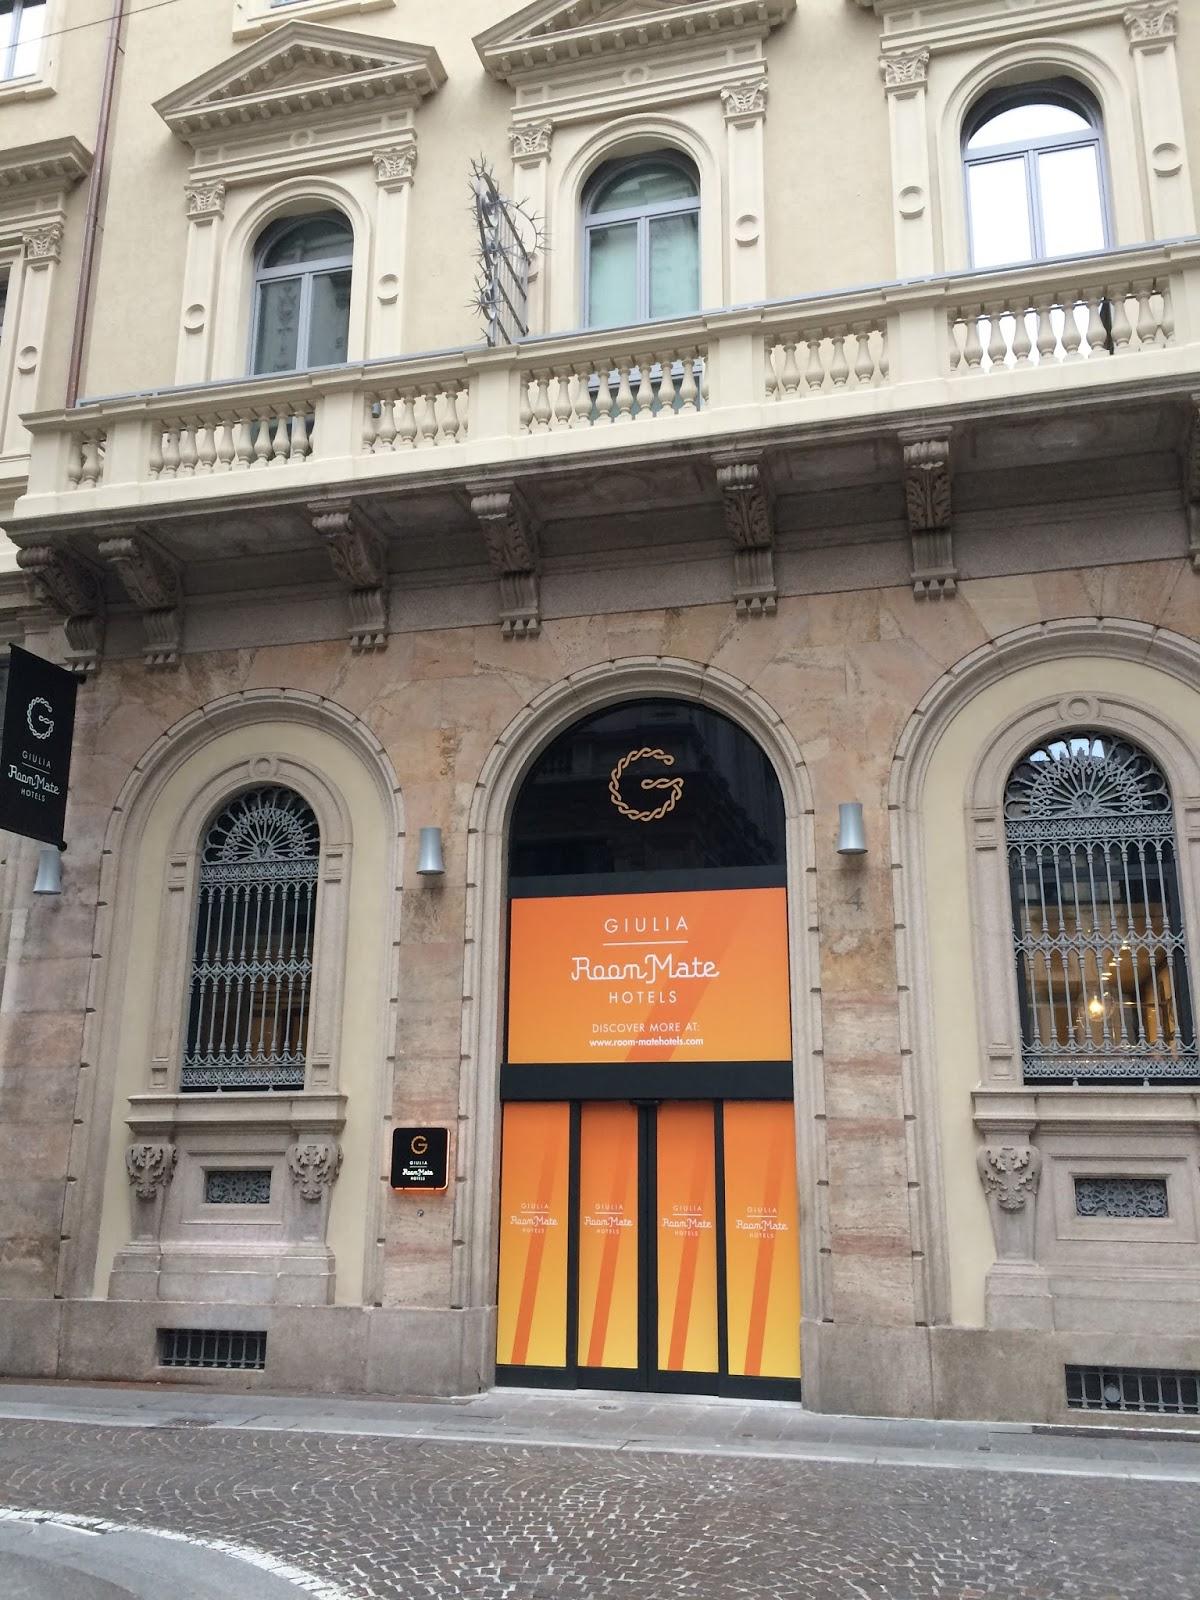 Porte a soffietto room mate giulia hotel milano - Porte a soffietto milano ...